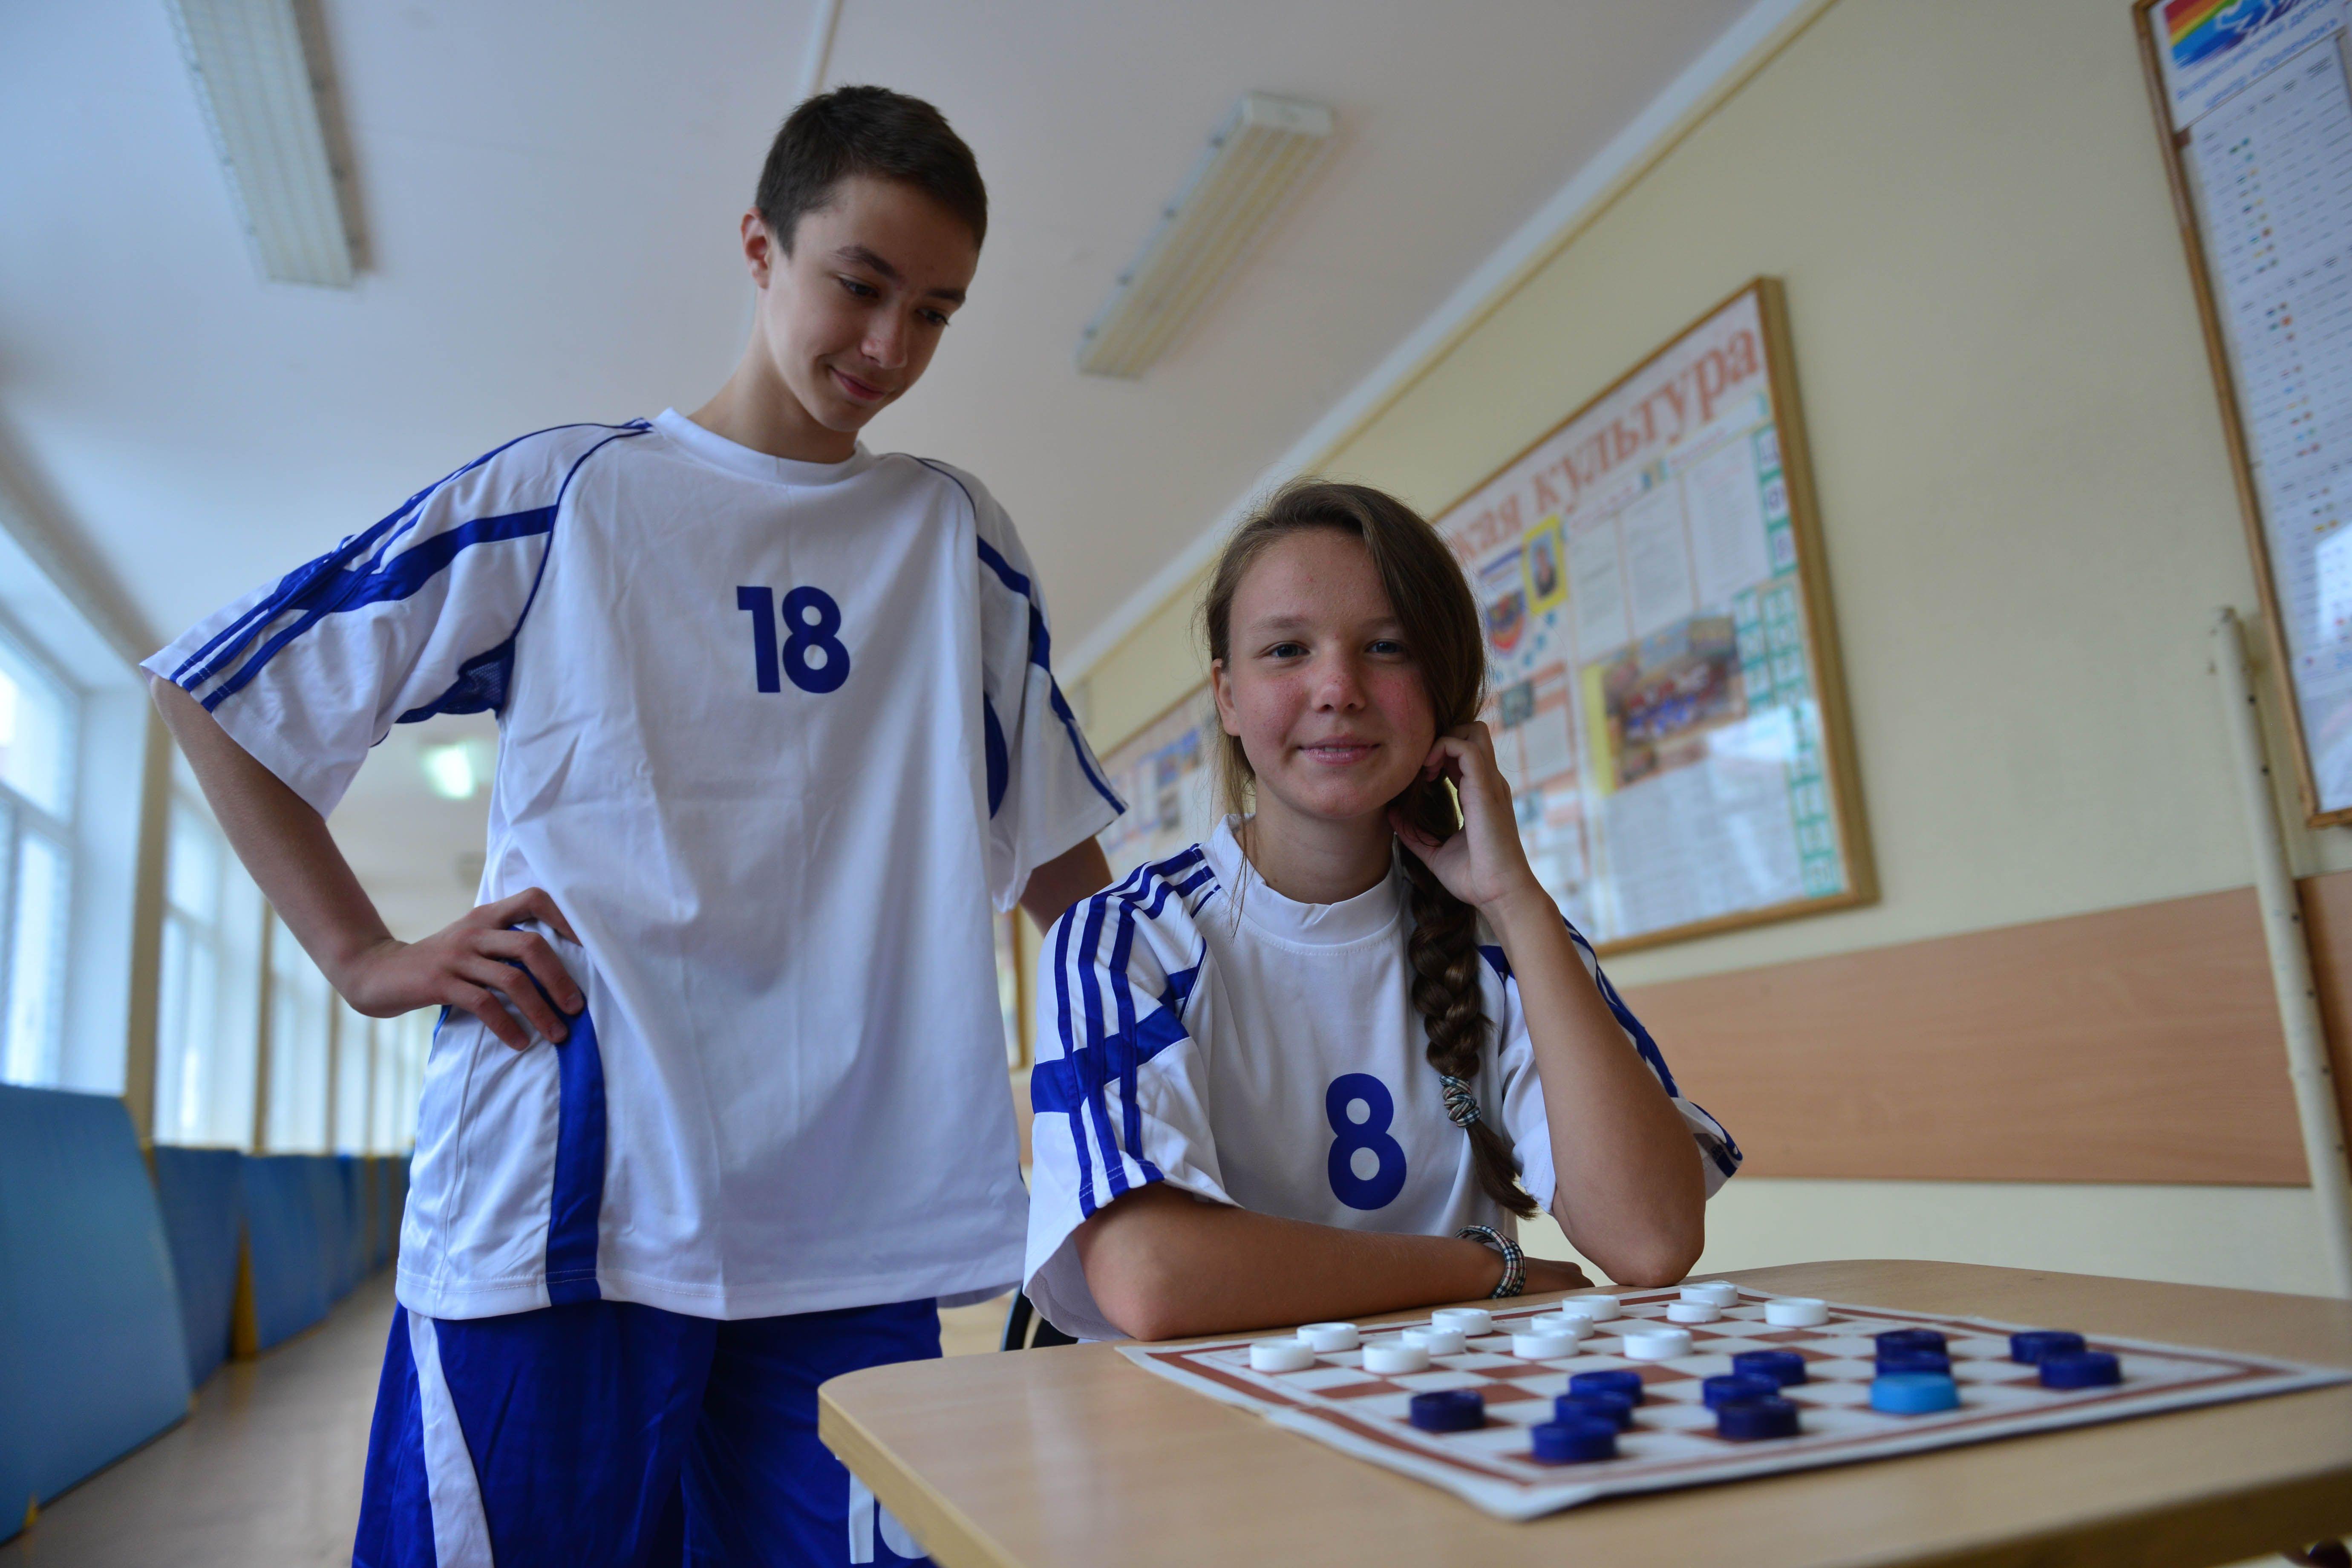 Депутат из Марушкинского организует турнир по шашкам